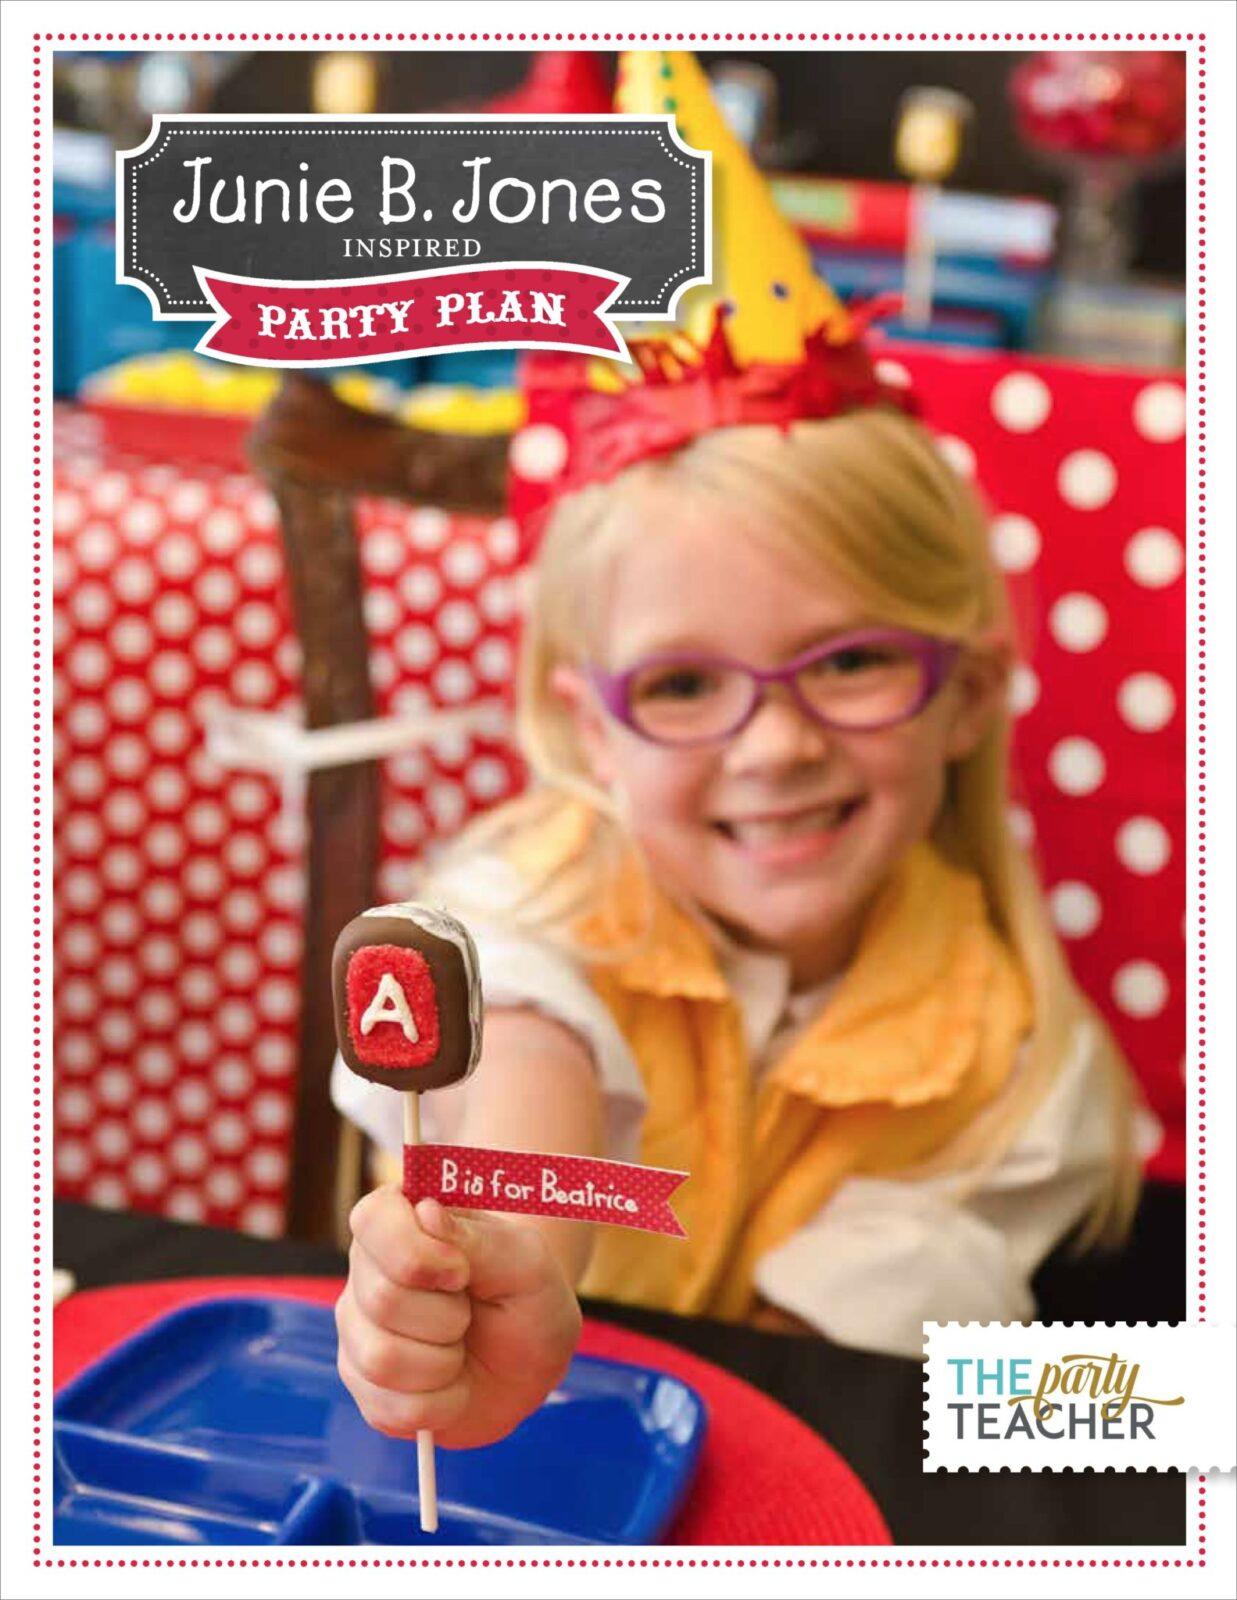 Dfp Junie B Jones Party Plan Final New Logo Only Page 01 Copy